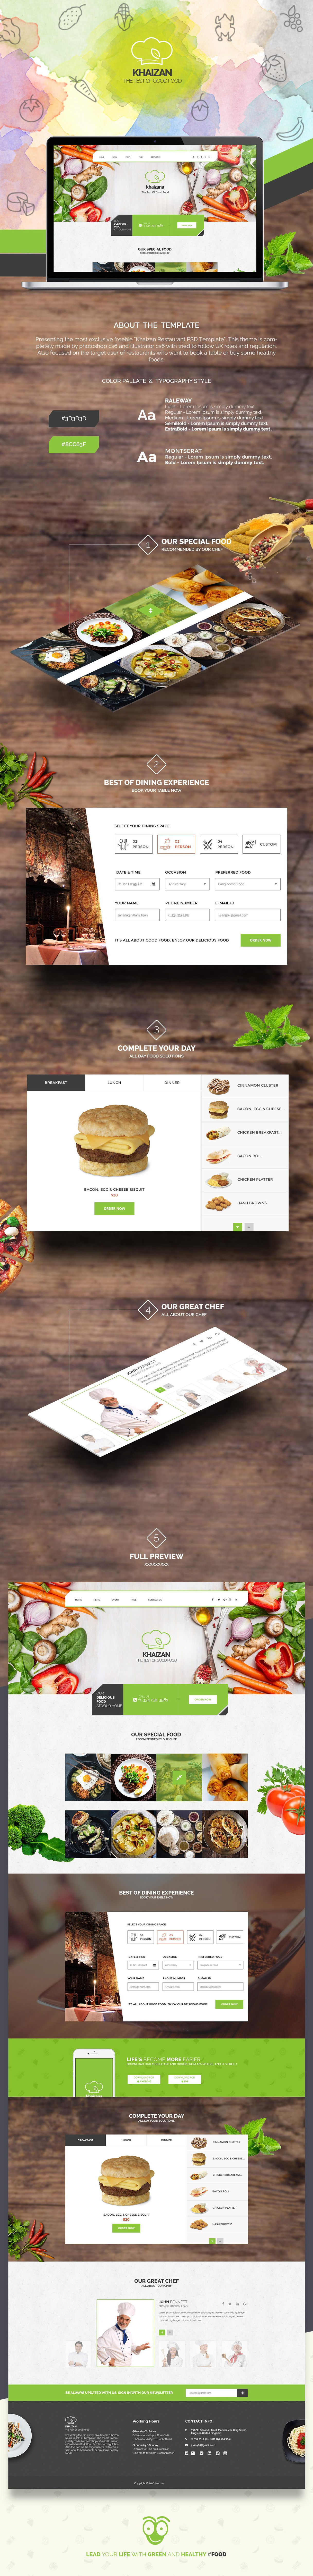 restaurant Food  Website freebie Restaurant Website flat design ui concept Multiple Option Web UI Food Website food corner healty food green Usabilaty